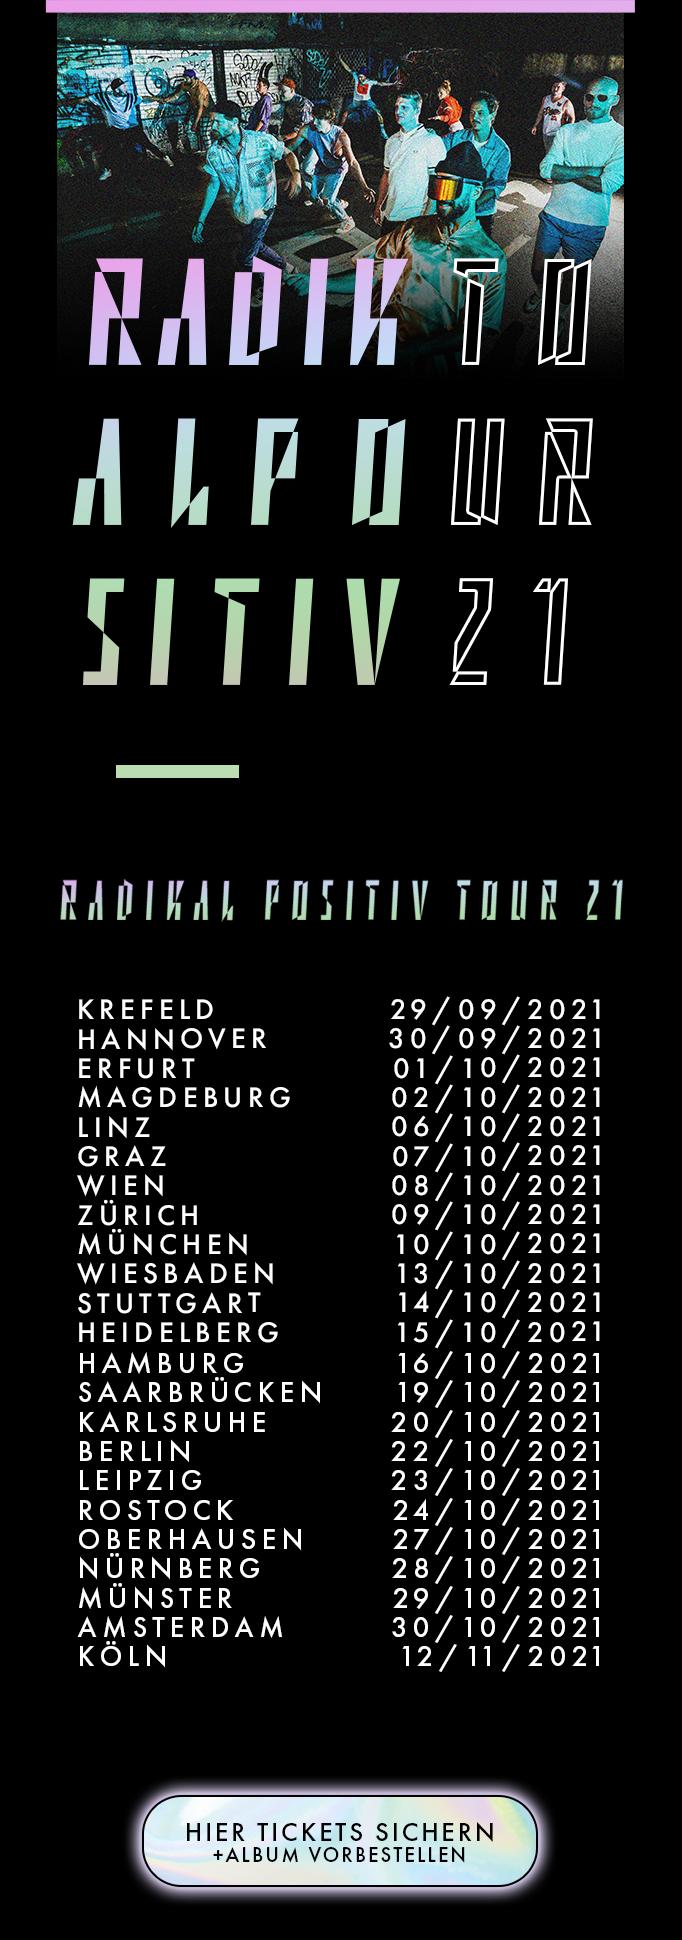 Querbeat Radikal Positiv Tour Termine Live 2021 Tickets